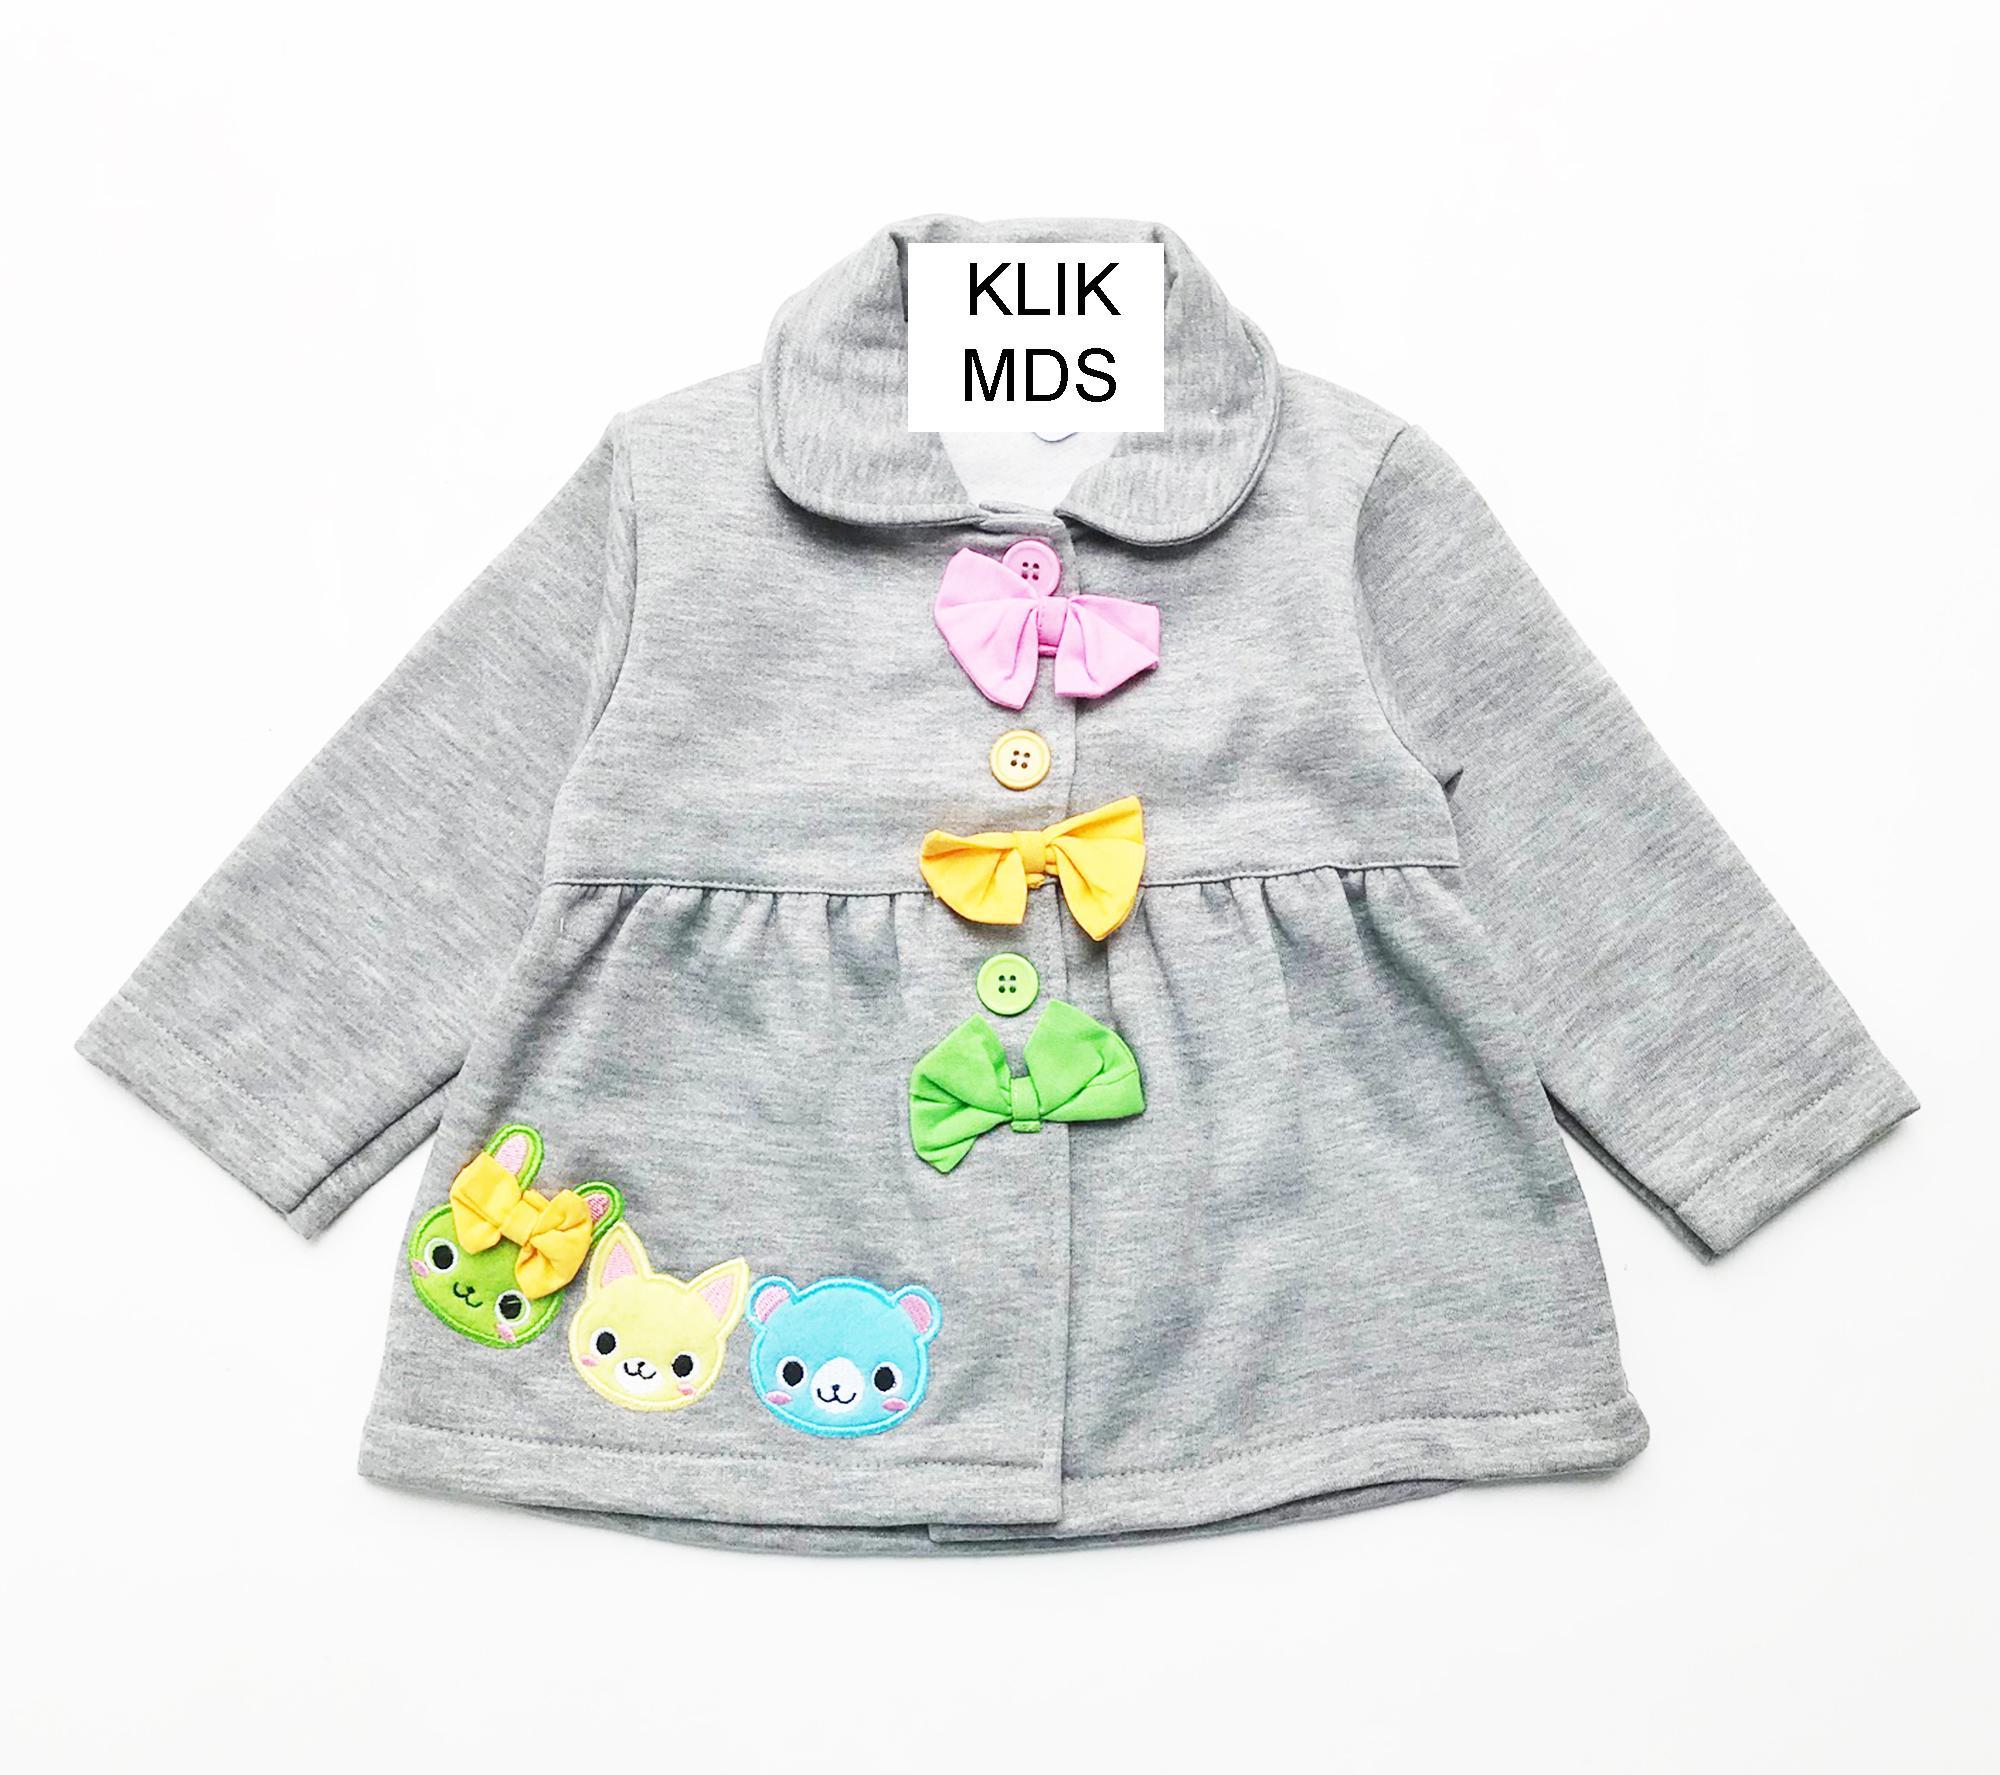 Klik Mds Baju Jaket Anak Bayi Perempuan / Jacket Motif Karakter Trio colourfull Bunny And Bear